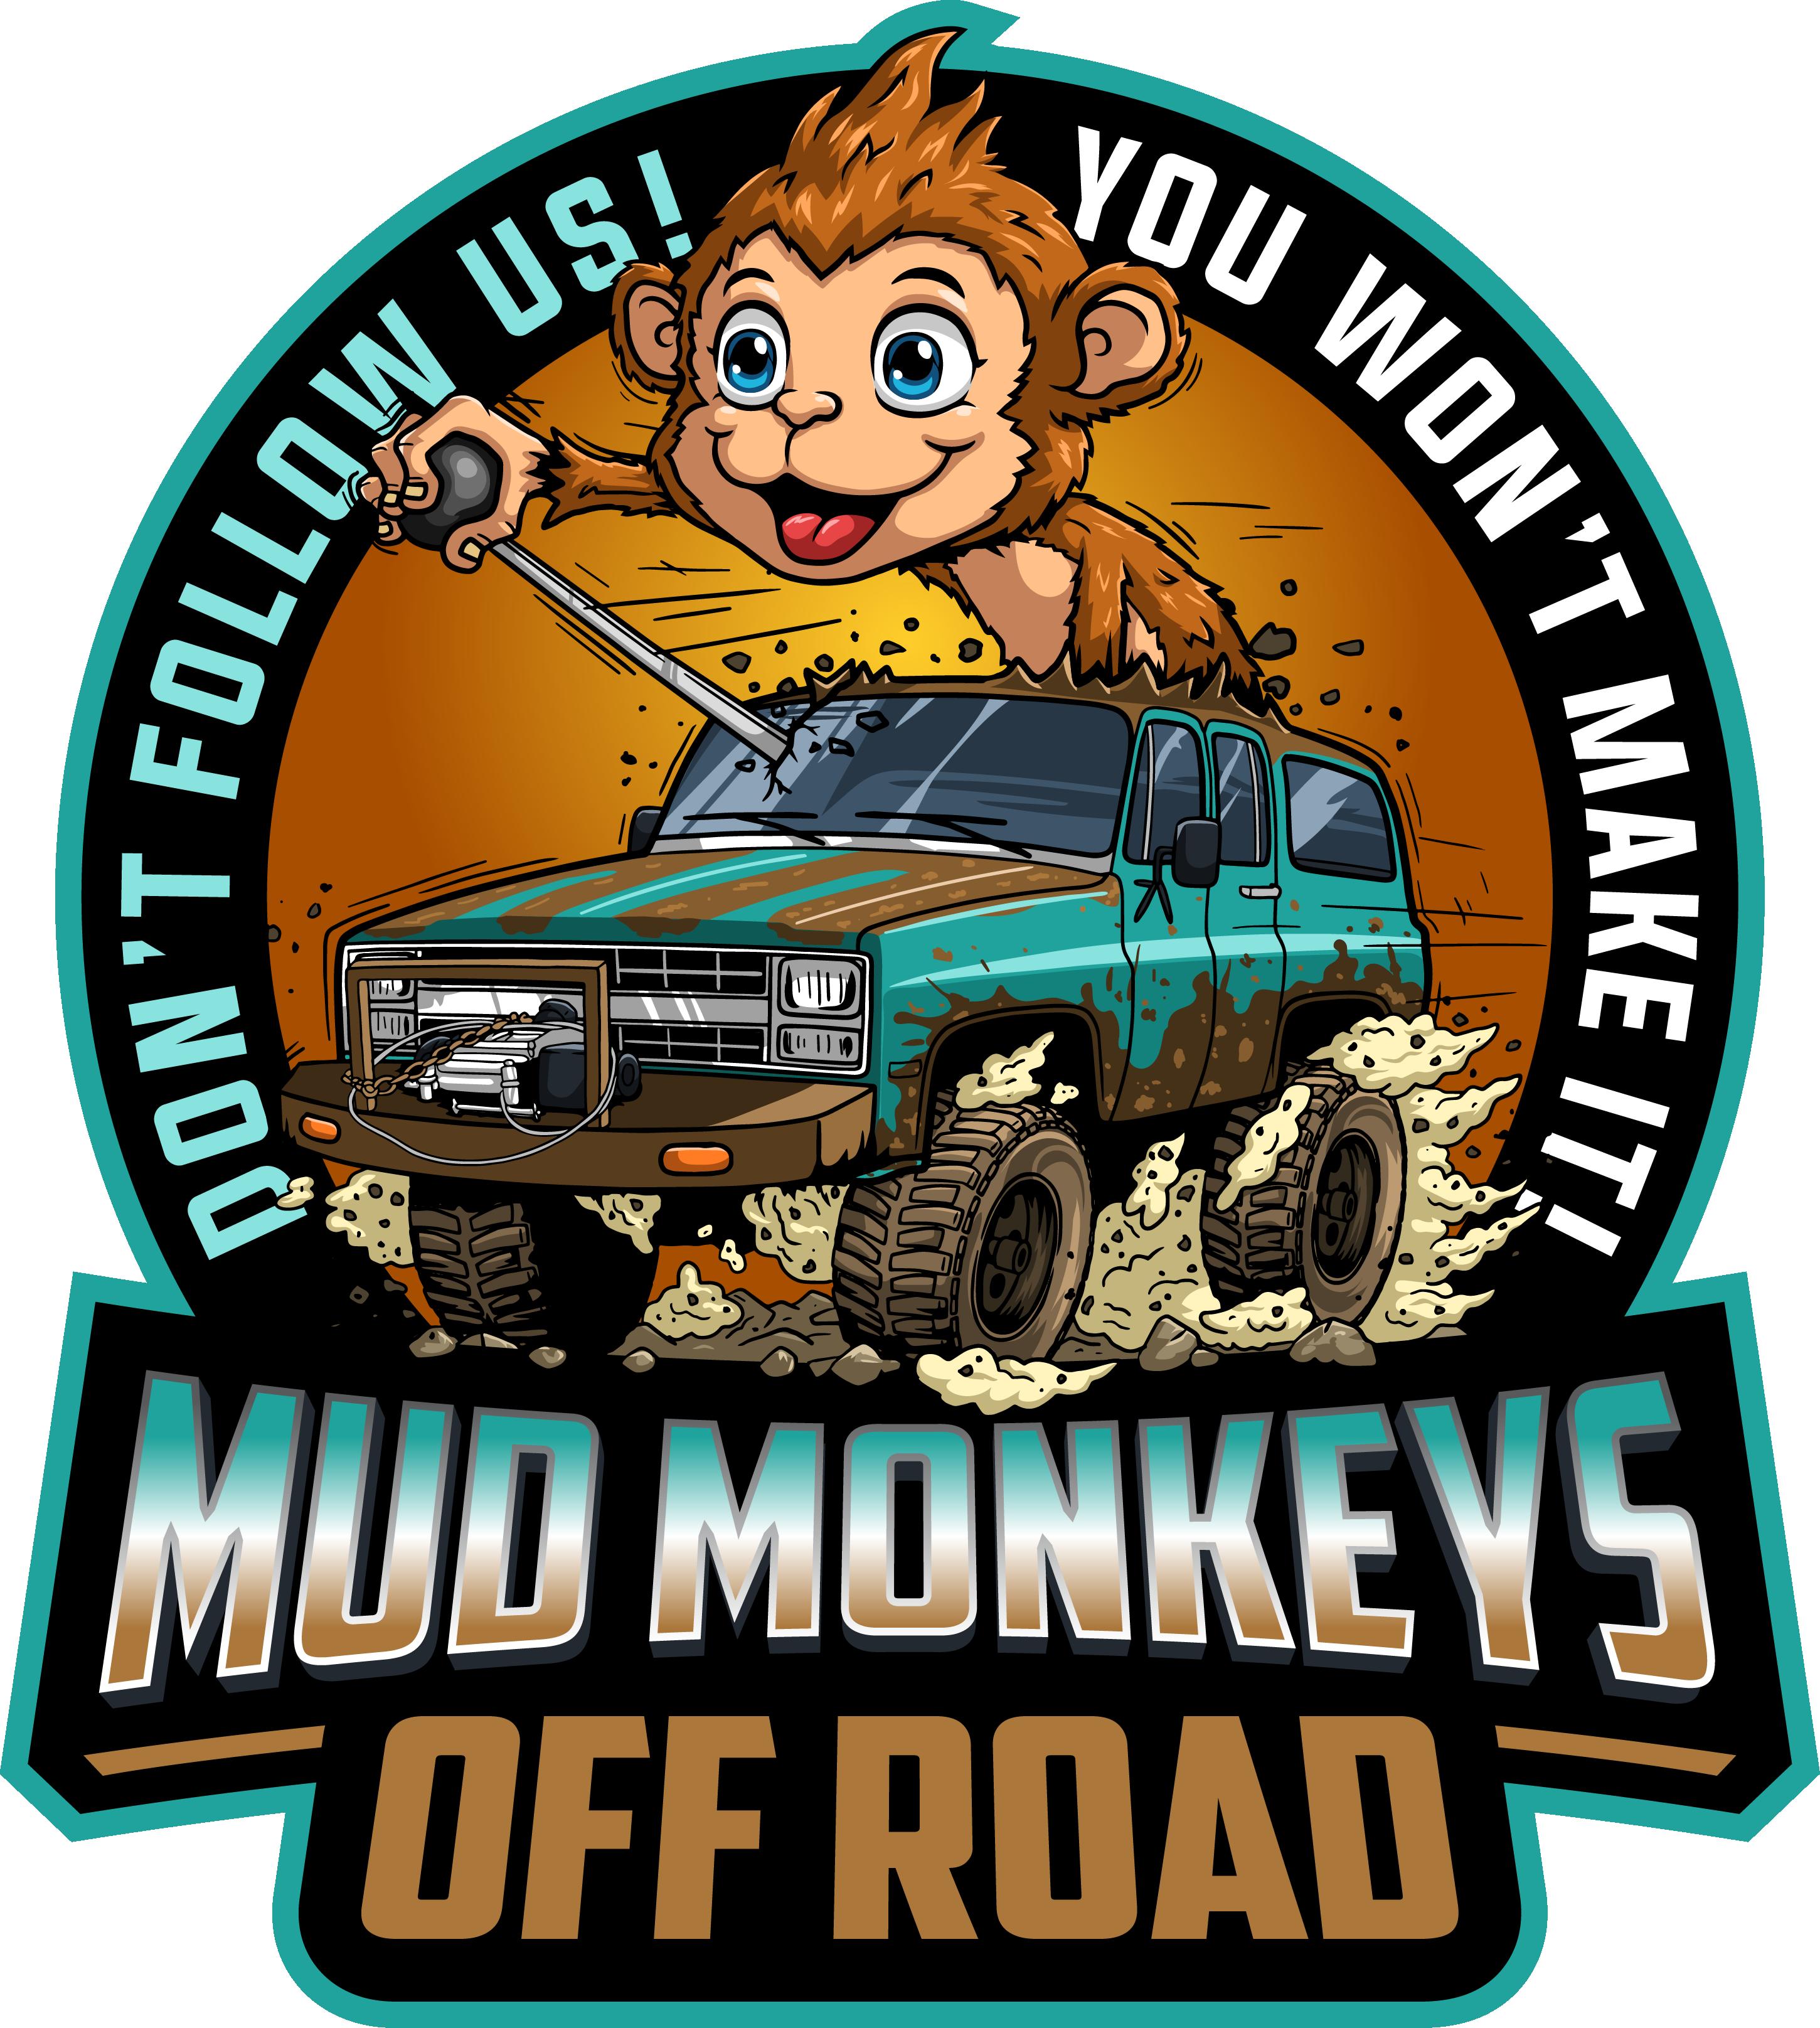 Off Road Club logo design!